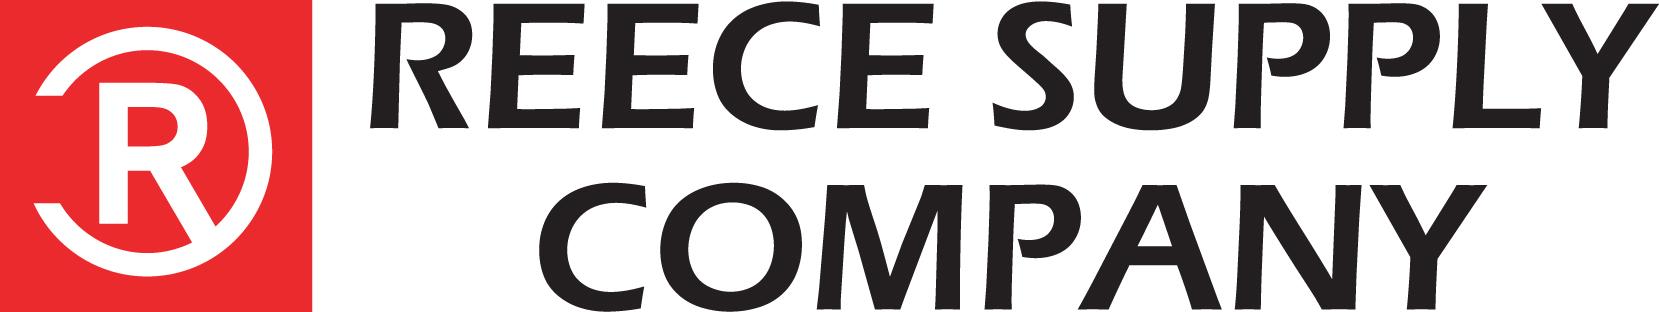 Reece Supply Co.